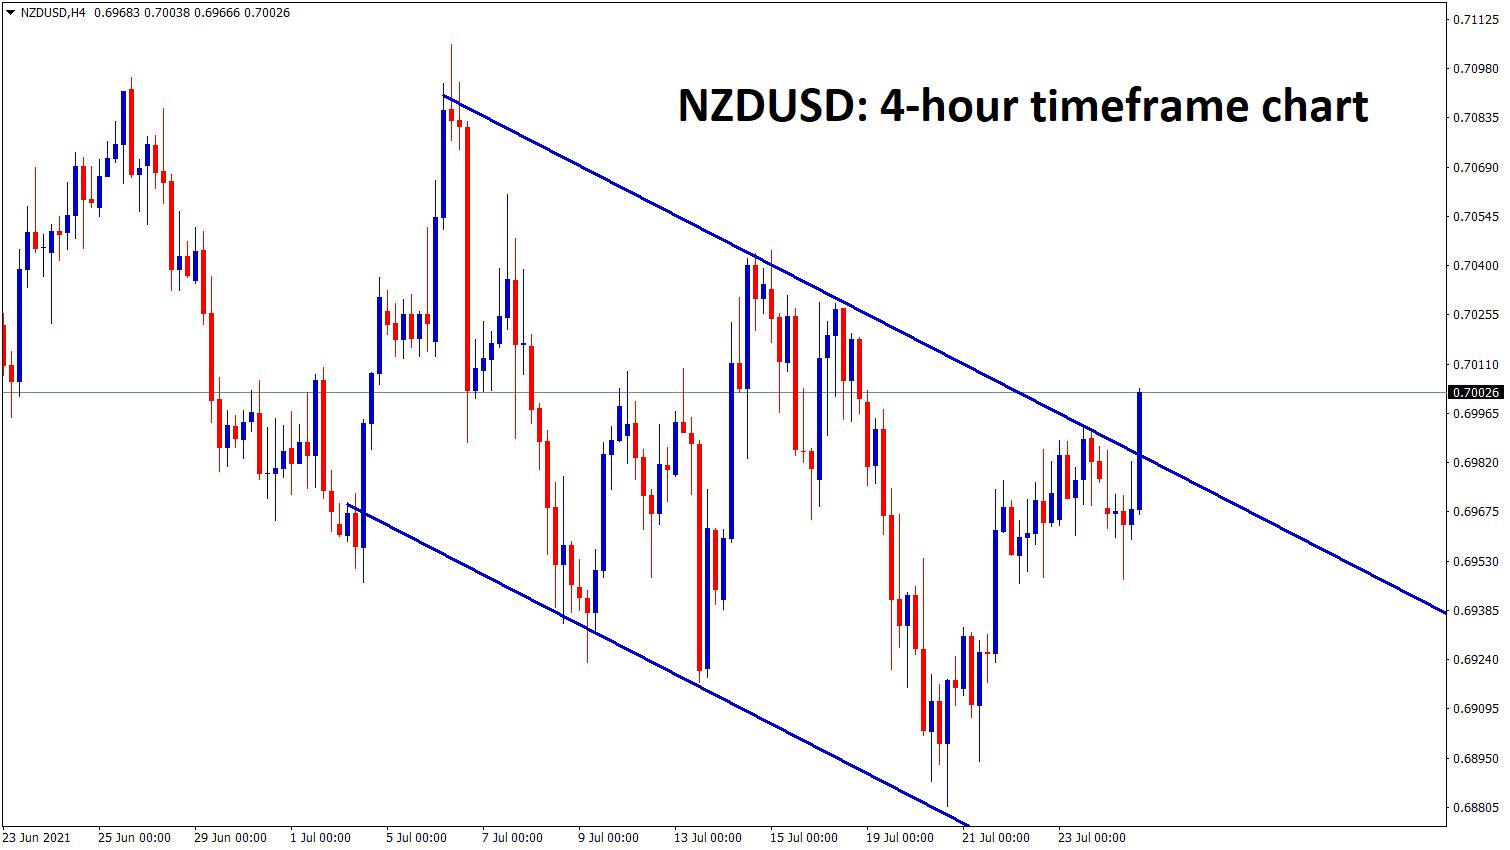 NZDUSD is trying to break the top of the Descending channel range